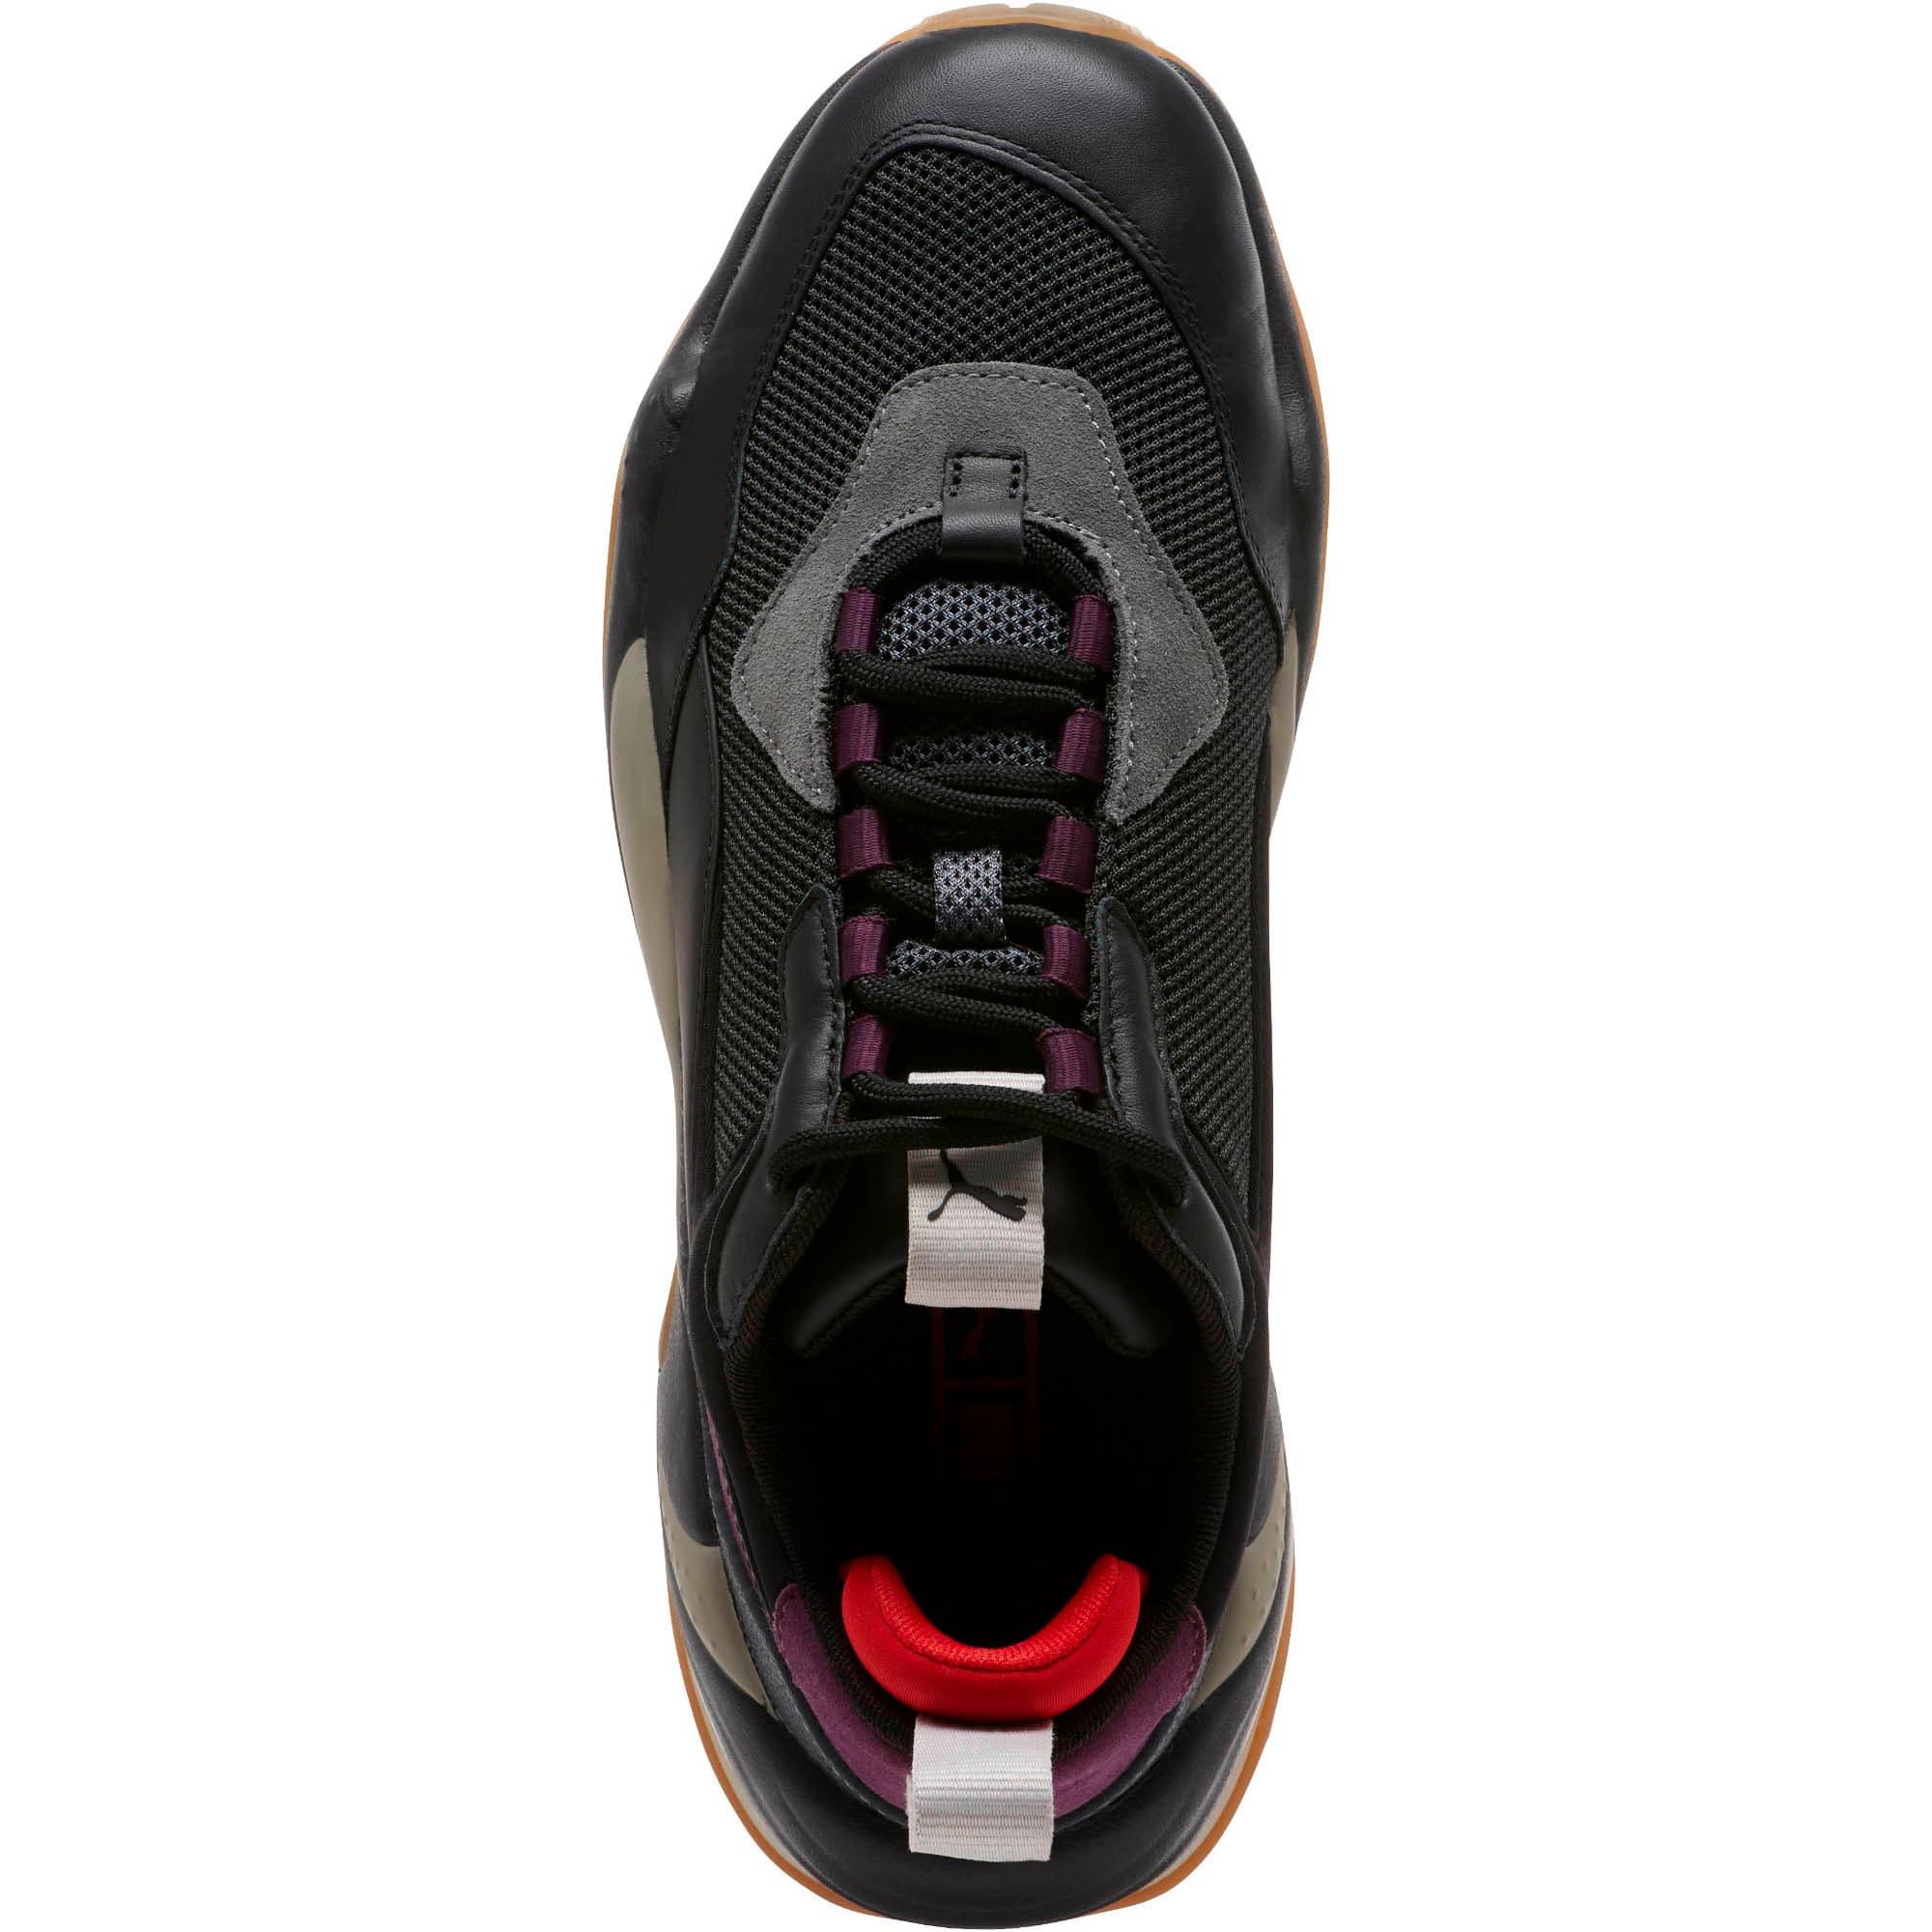 Thumbnail 5 of Thunder Spectra Sneakers, Puma Black, medium